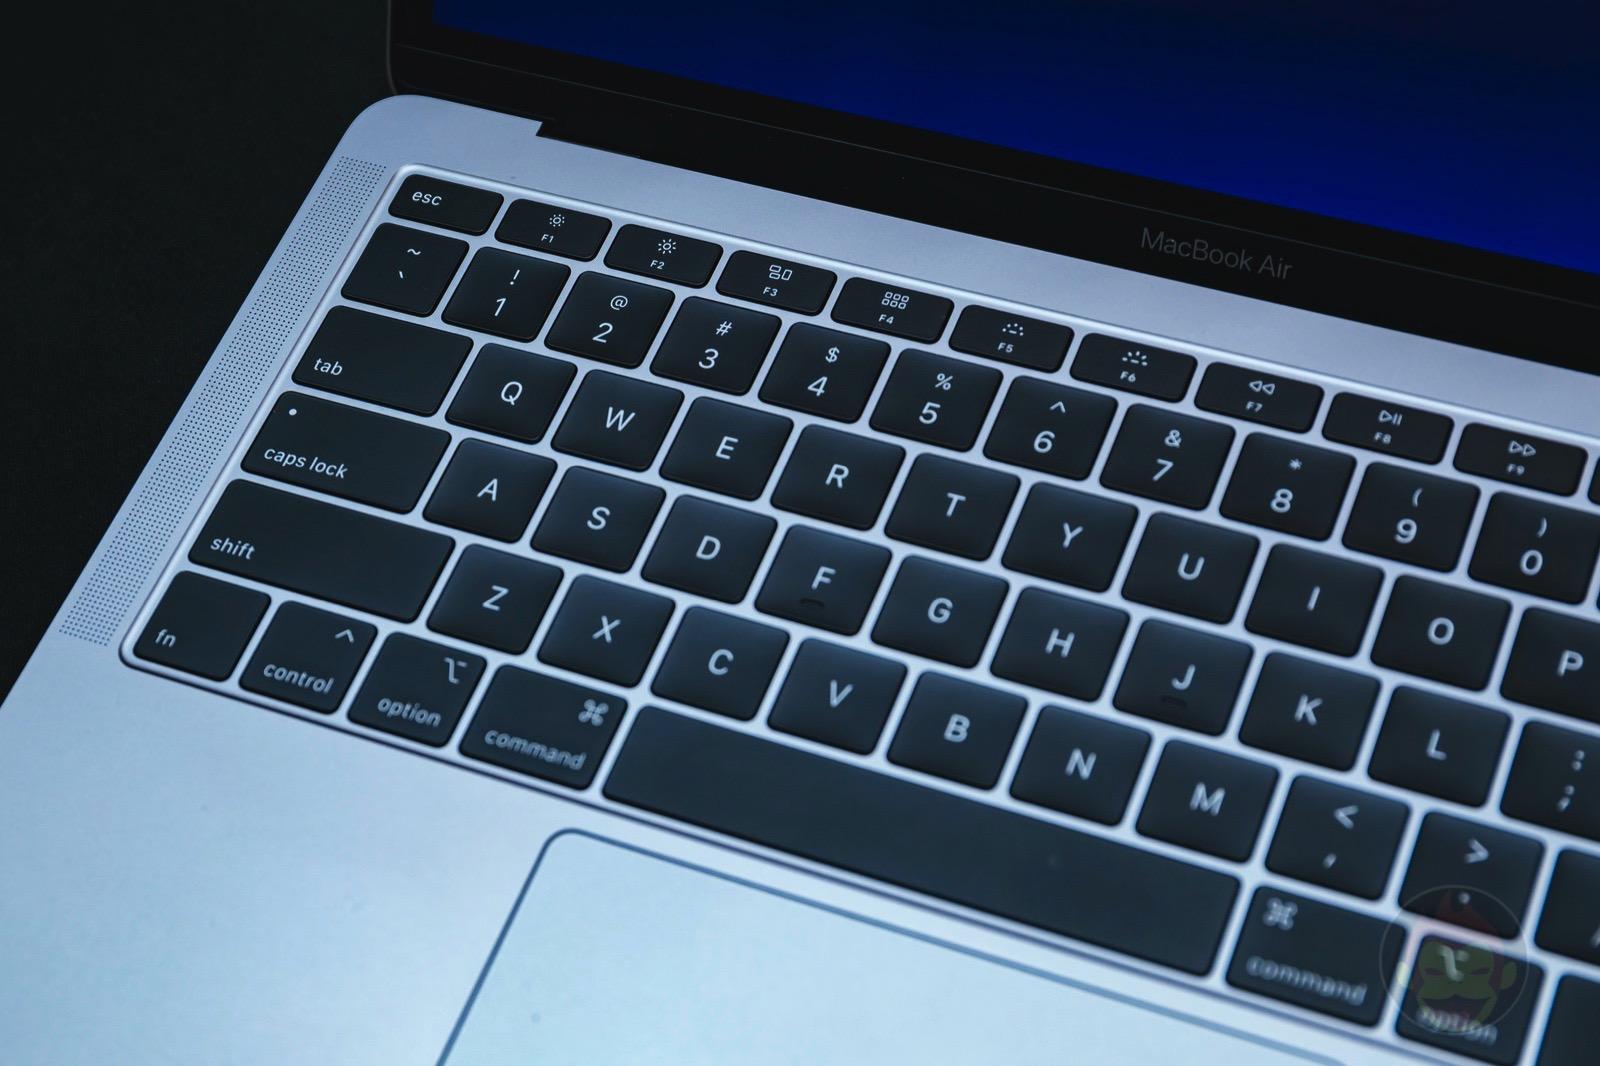 MacBook-Air-2018-benchmarks-01.jpg